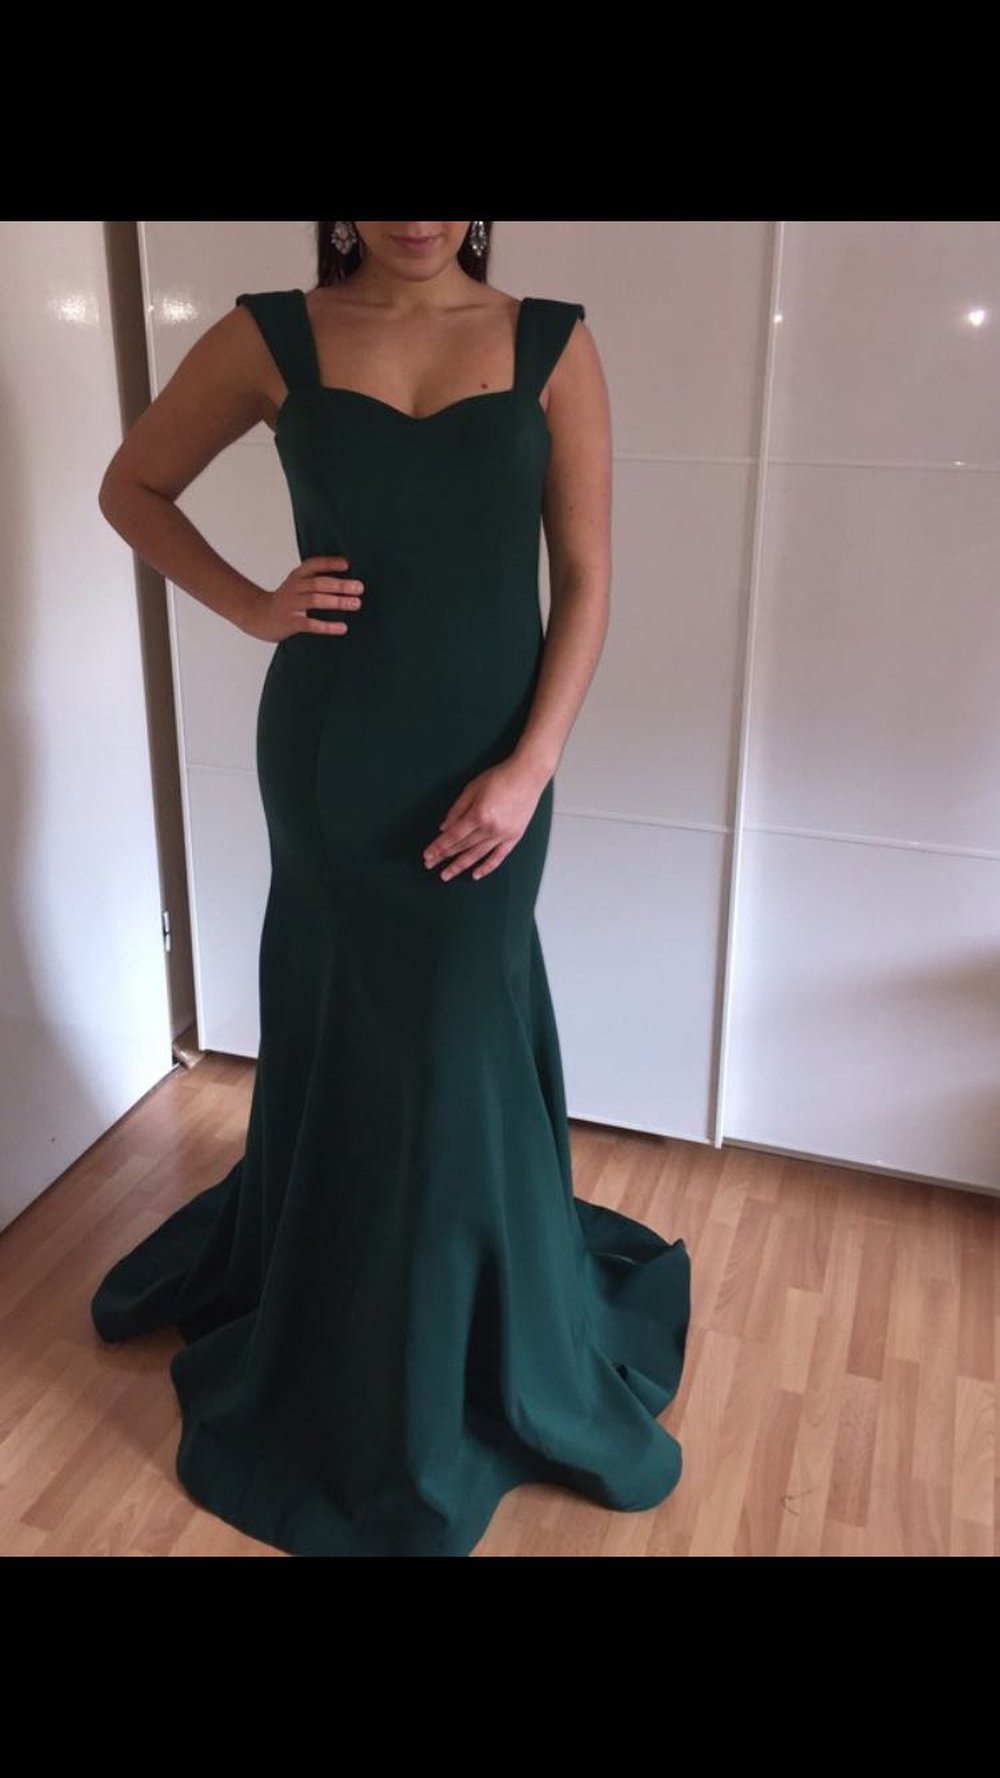 Formal Großartig Dunkelgrünes Abendkleid für 2019Formal Schön Dunkelgrünes Abendkleid Boutique